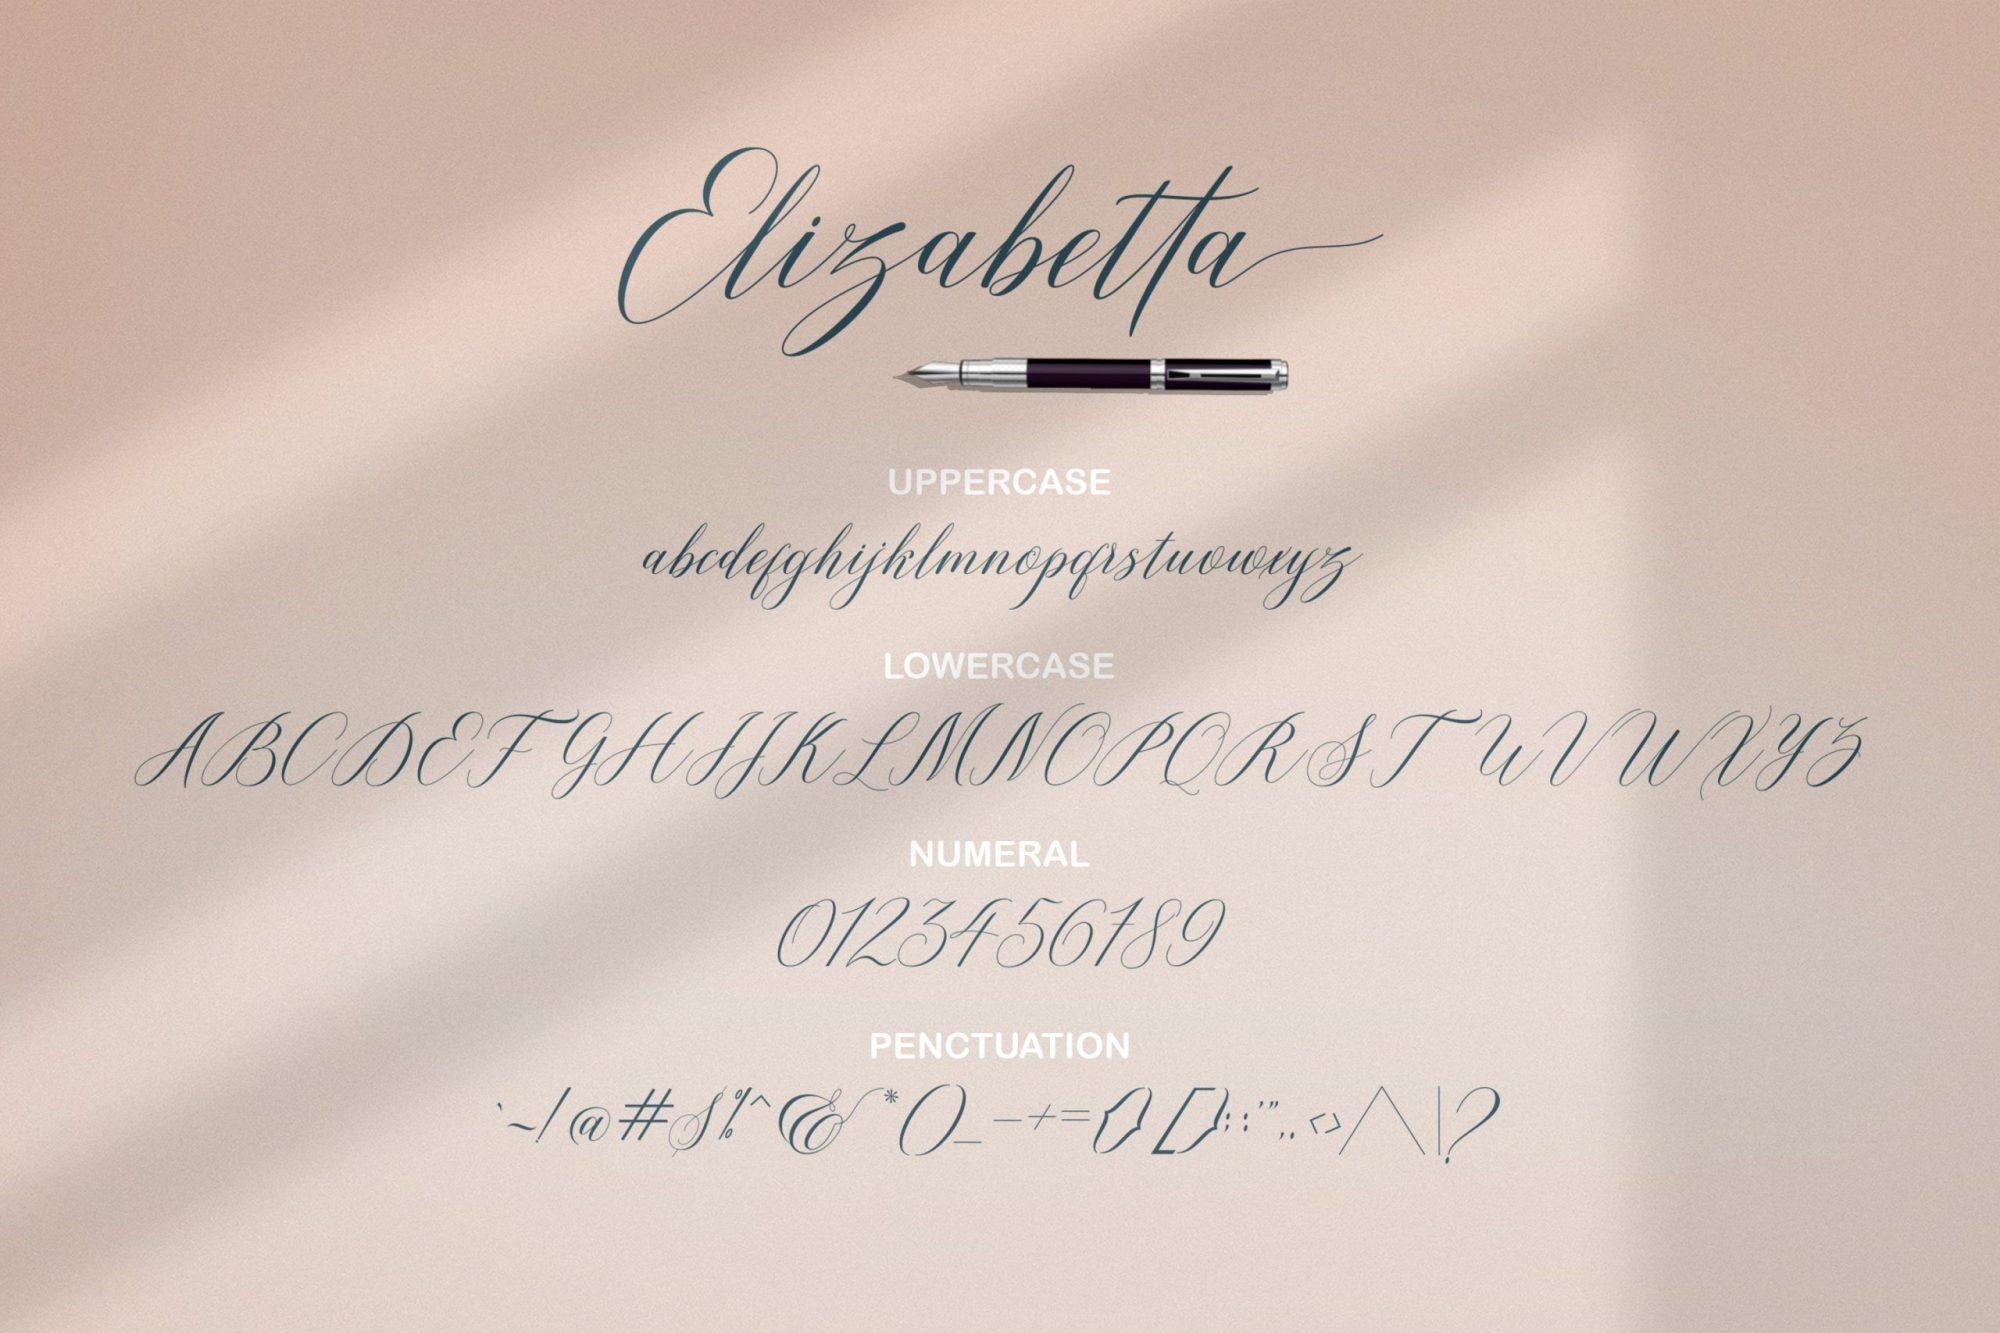 Elizabetta-Script-Calligraphy-Font-3-scaled